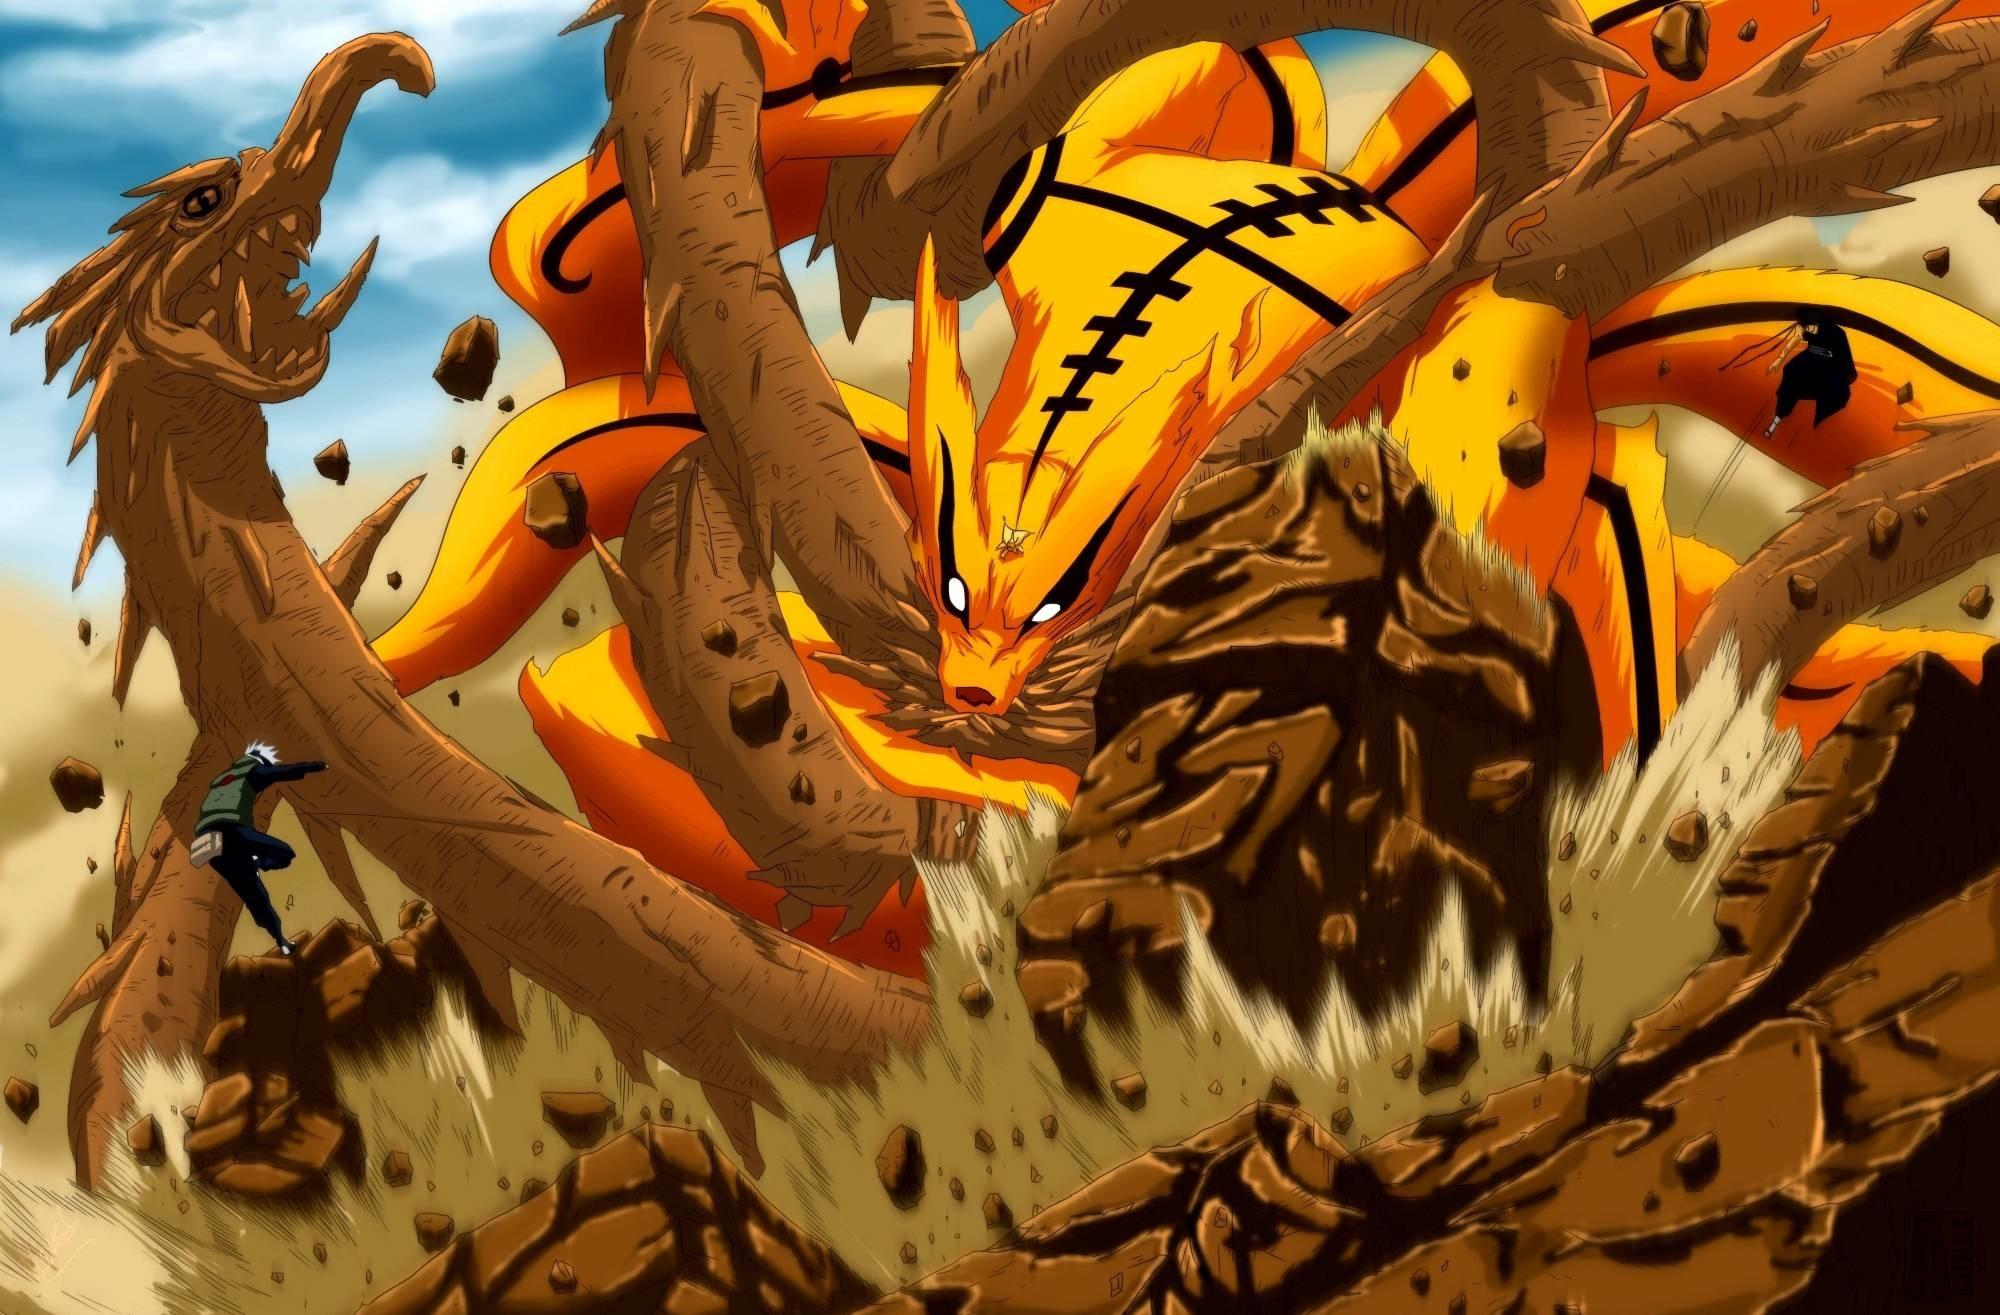 Nine tails vs dragon